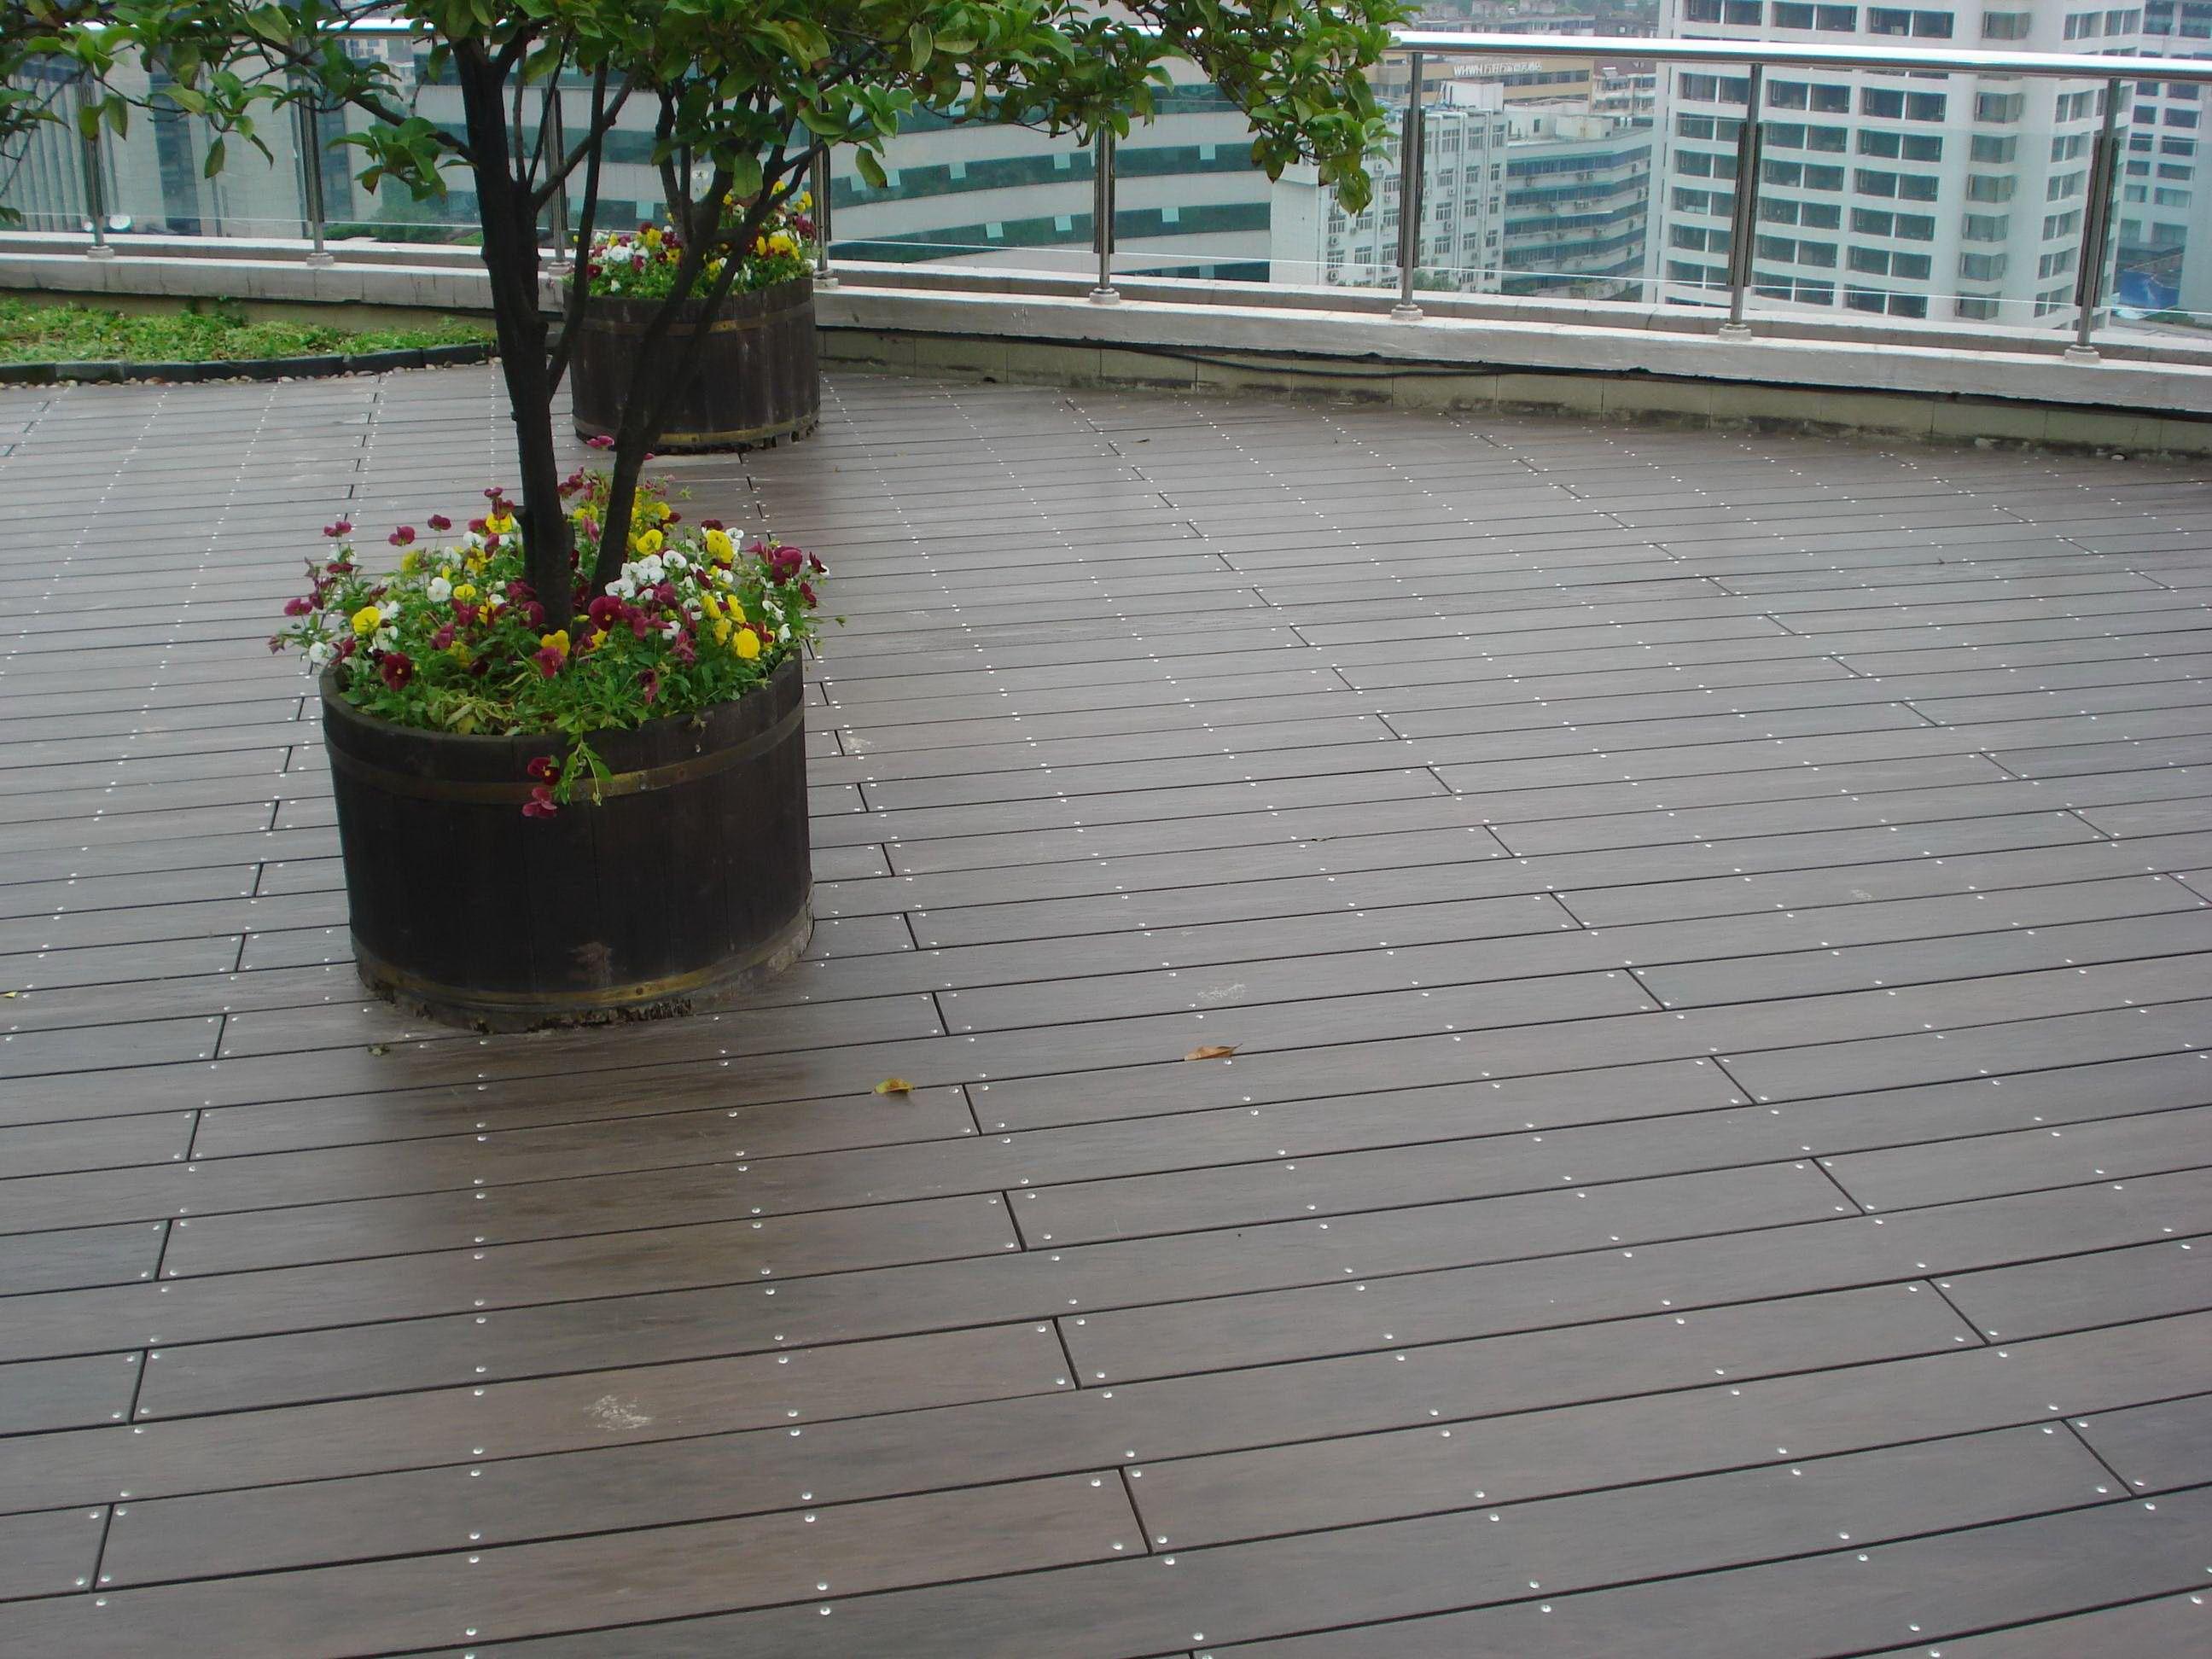 Cost Per Square Foot Of Composite Deck Outdoor Deck Wood Flooring Distributers In Uae Outside Waterproof Flo Outdoor Wood Decking Outdoor Flooring Outdoor Deck